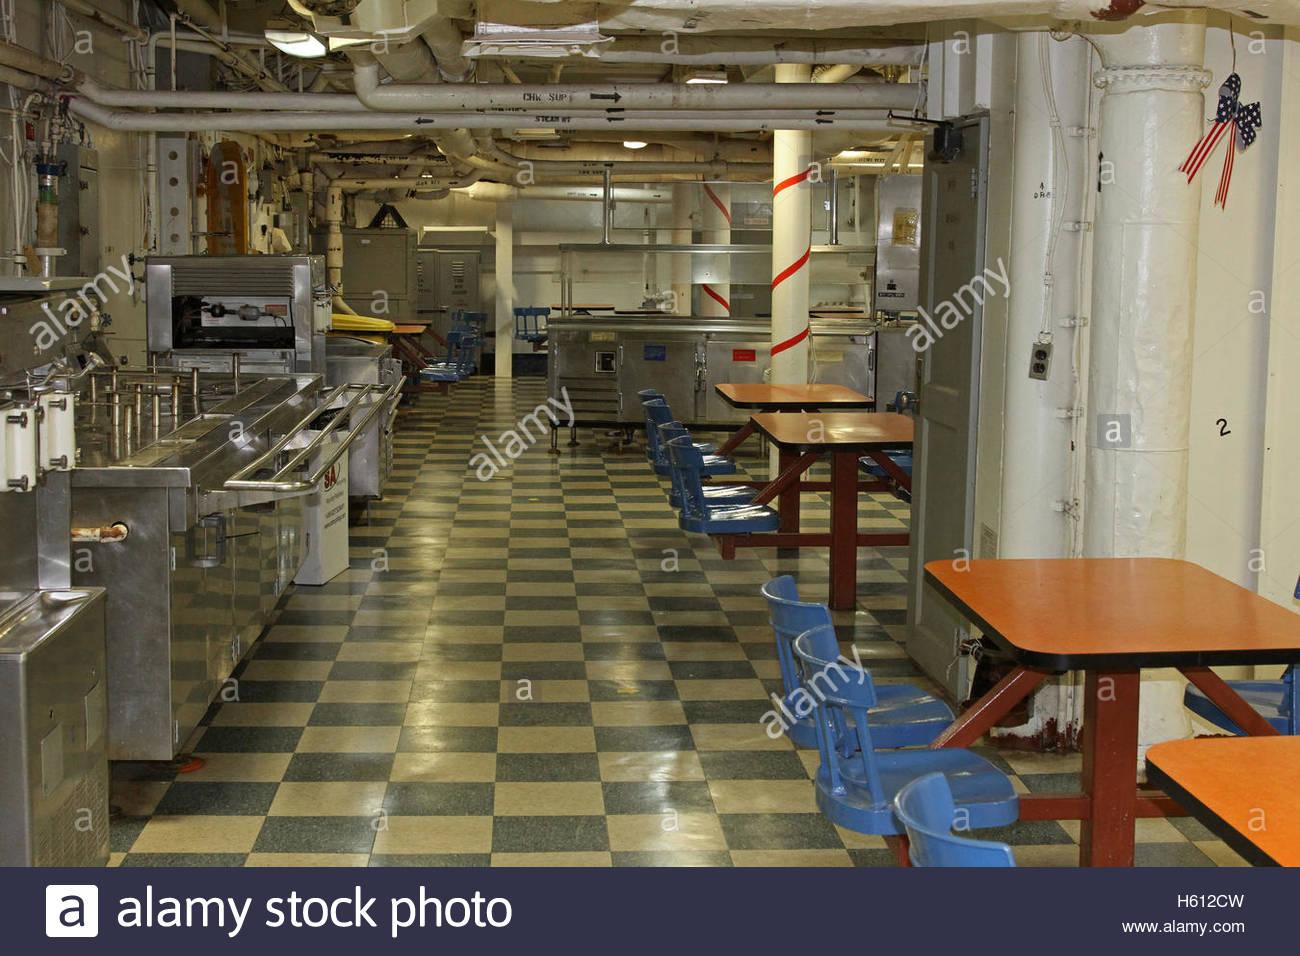 USS Iowa, mess hall, San Pedro California, first public tour July 7 2012, historic battleship, U.S. Navy - Stock Image